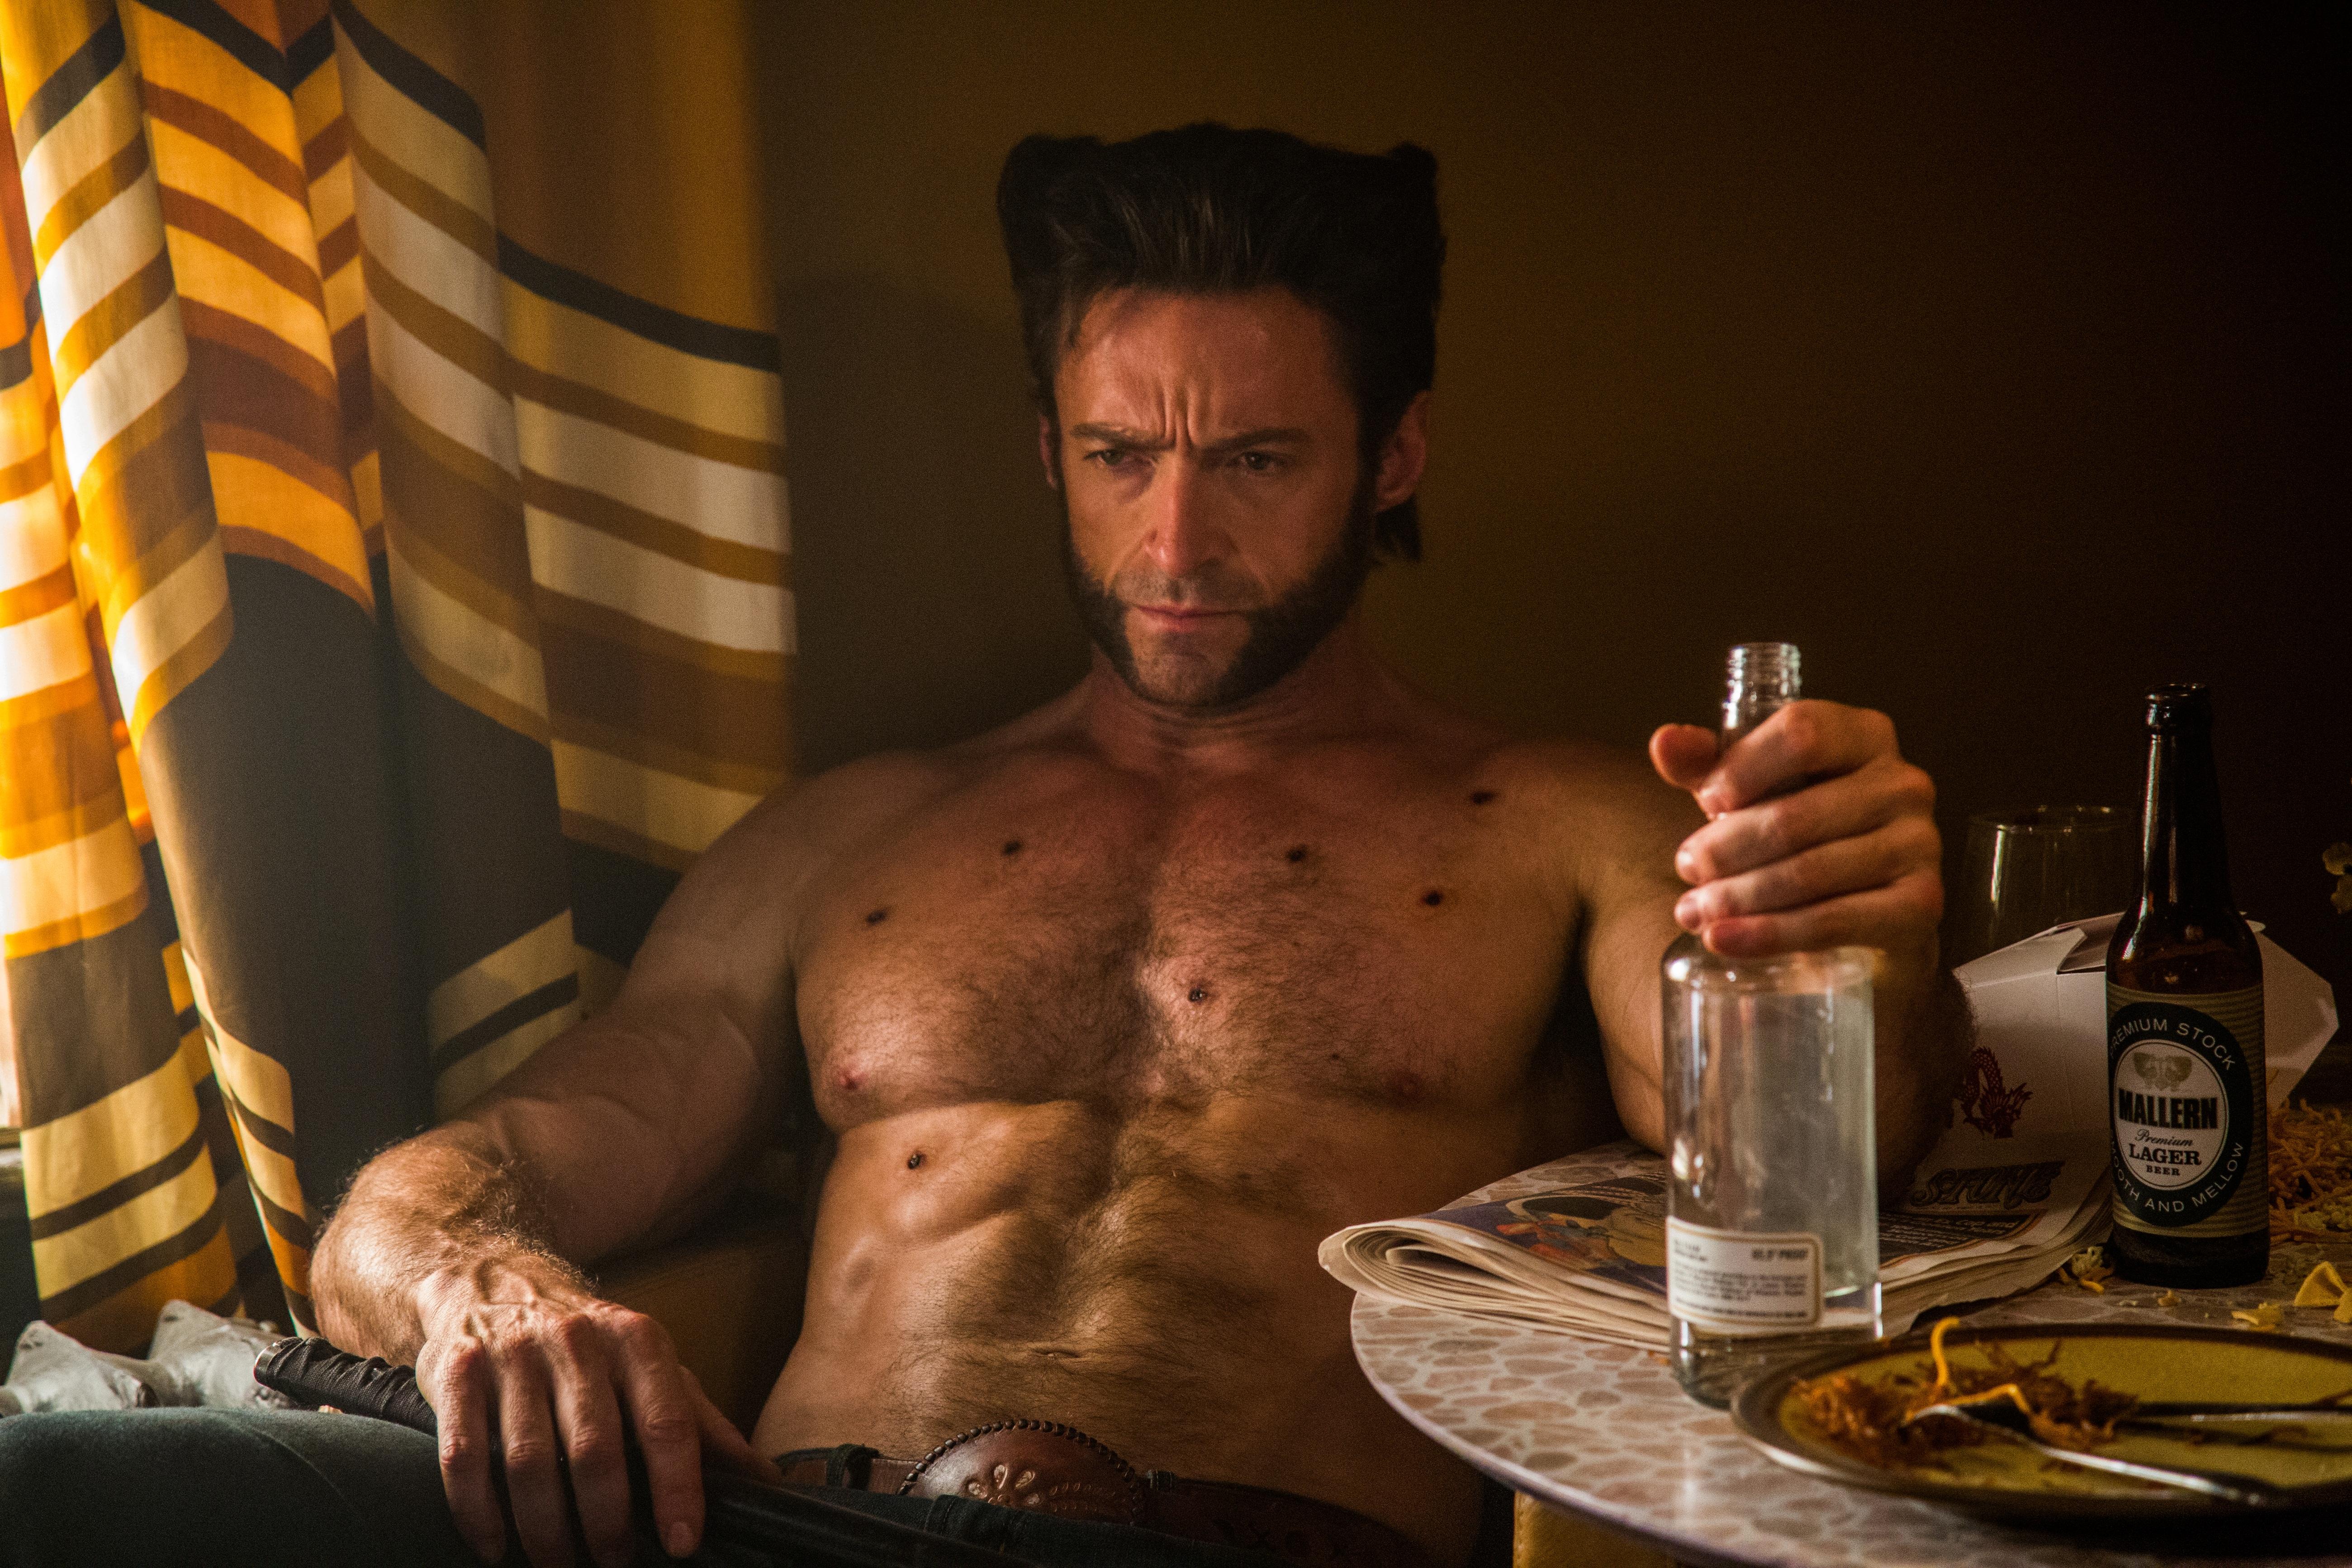 X Men Dias de um Futuro Esquecido Days of Future Past Wolverine